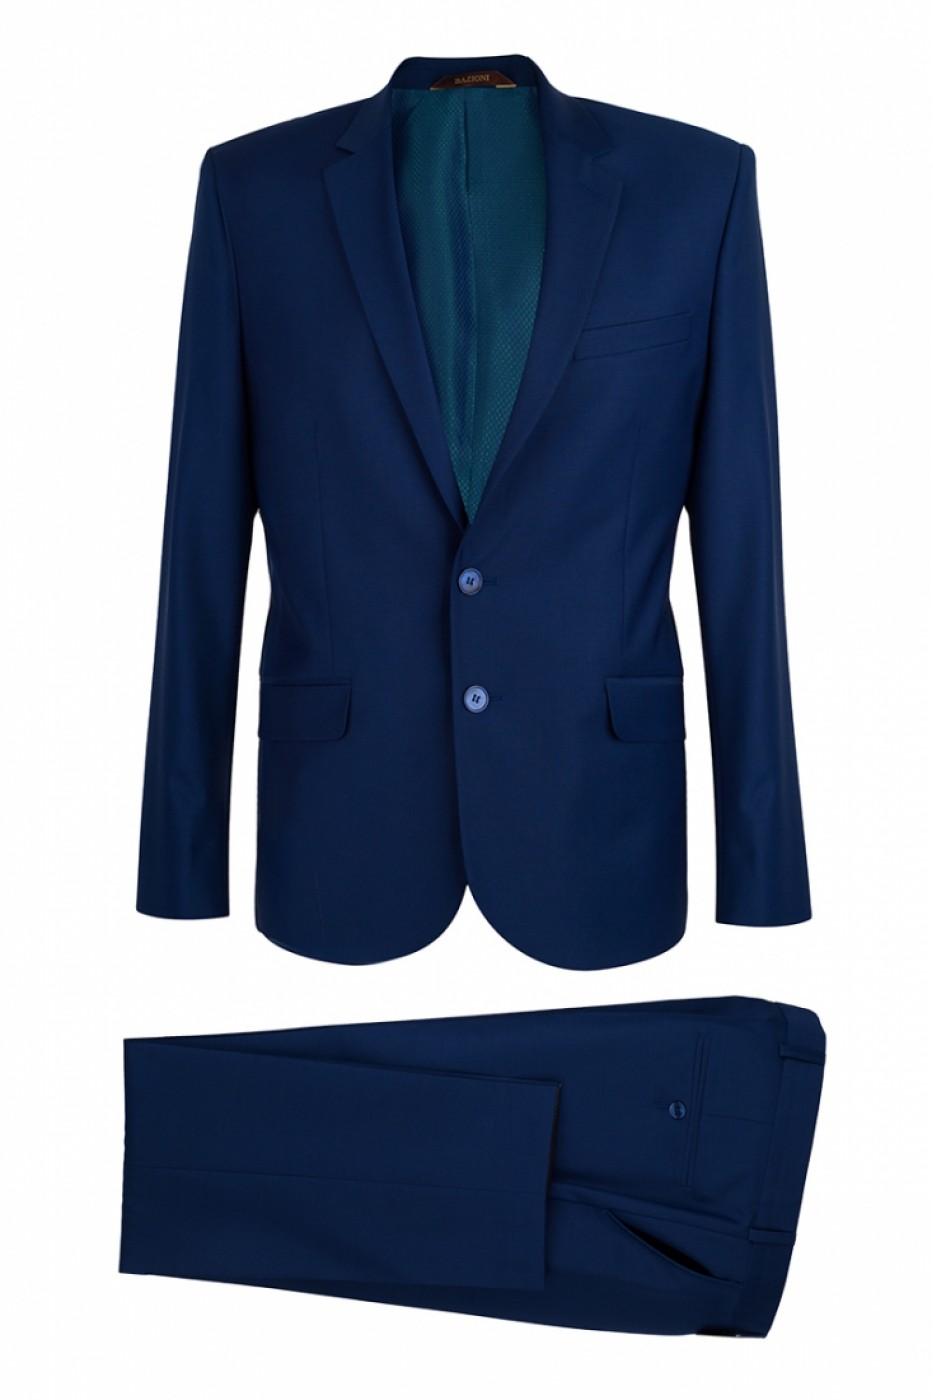 Тёмно-синий мужской костюм 1521*S POINT LUX